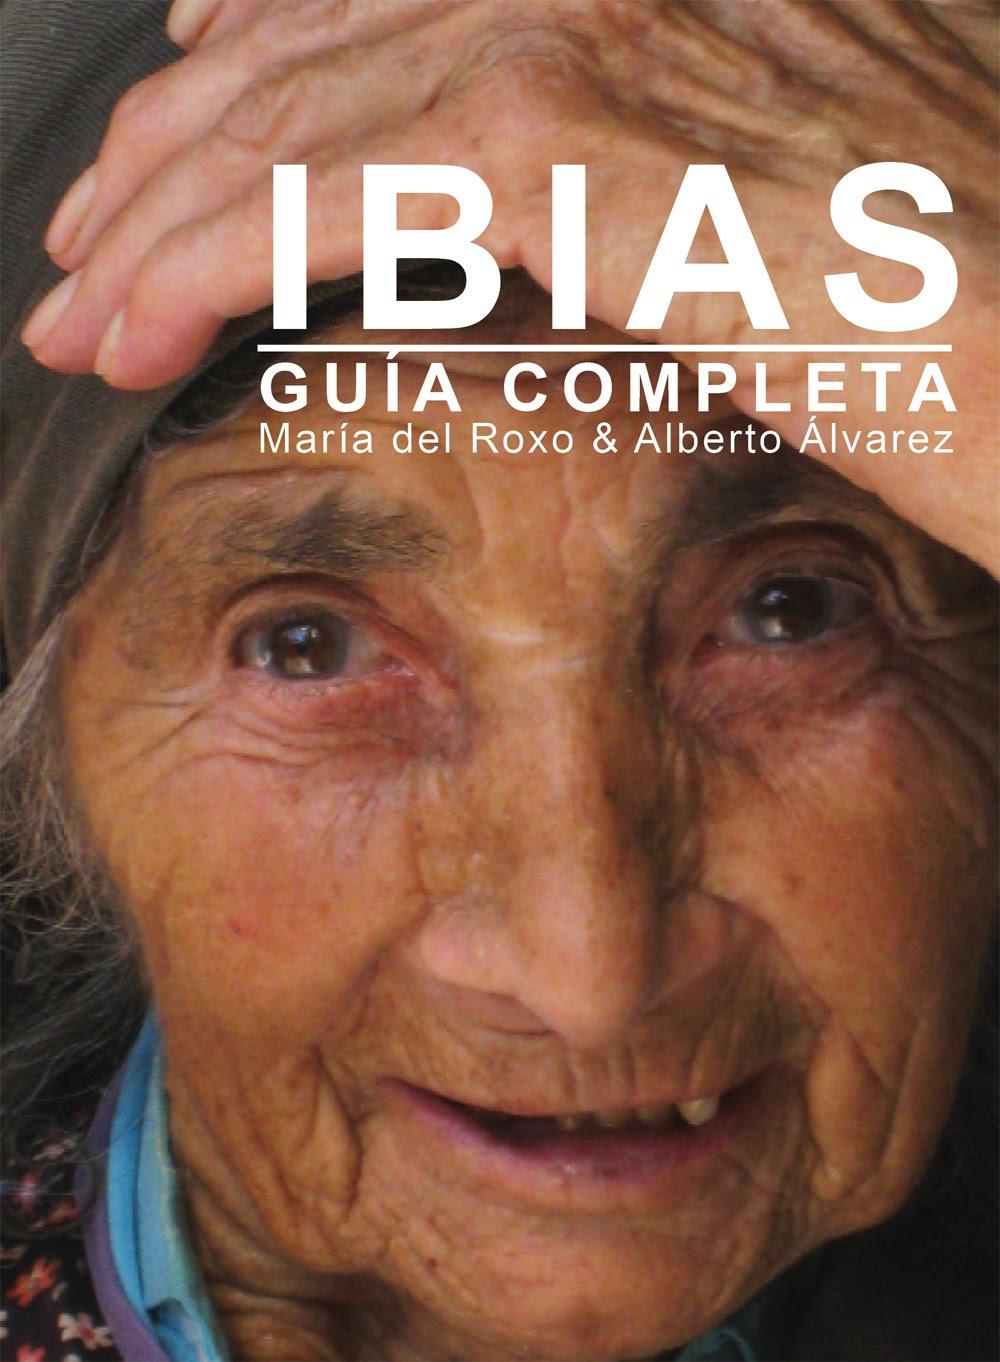 IBIAS: GUÍA COMPLETA